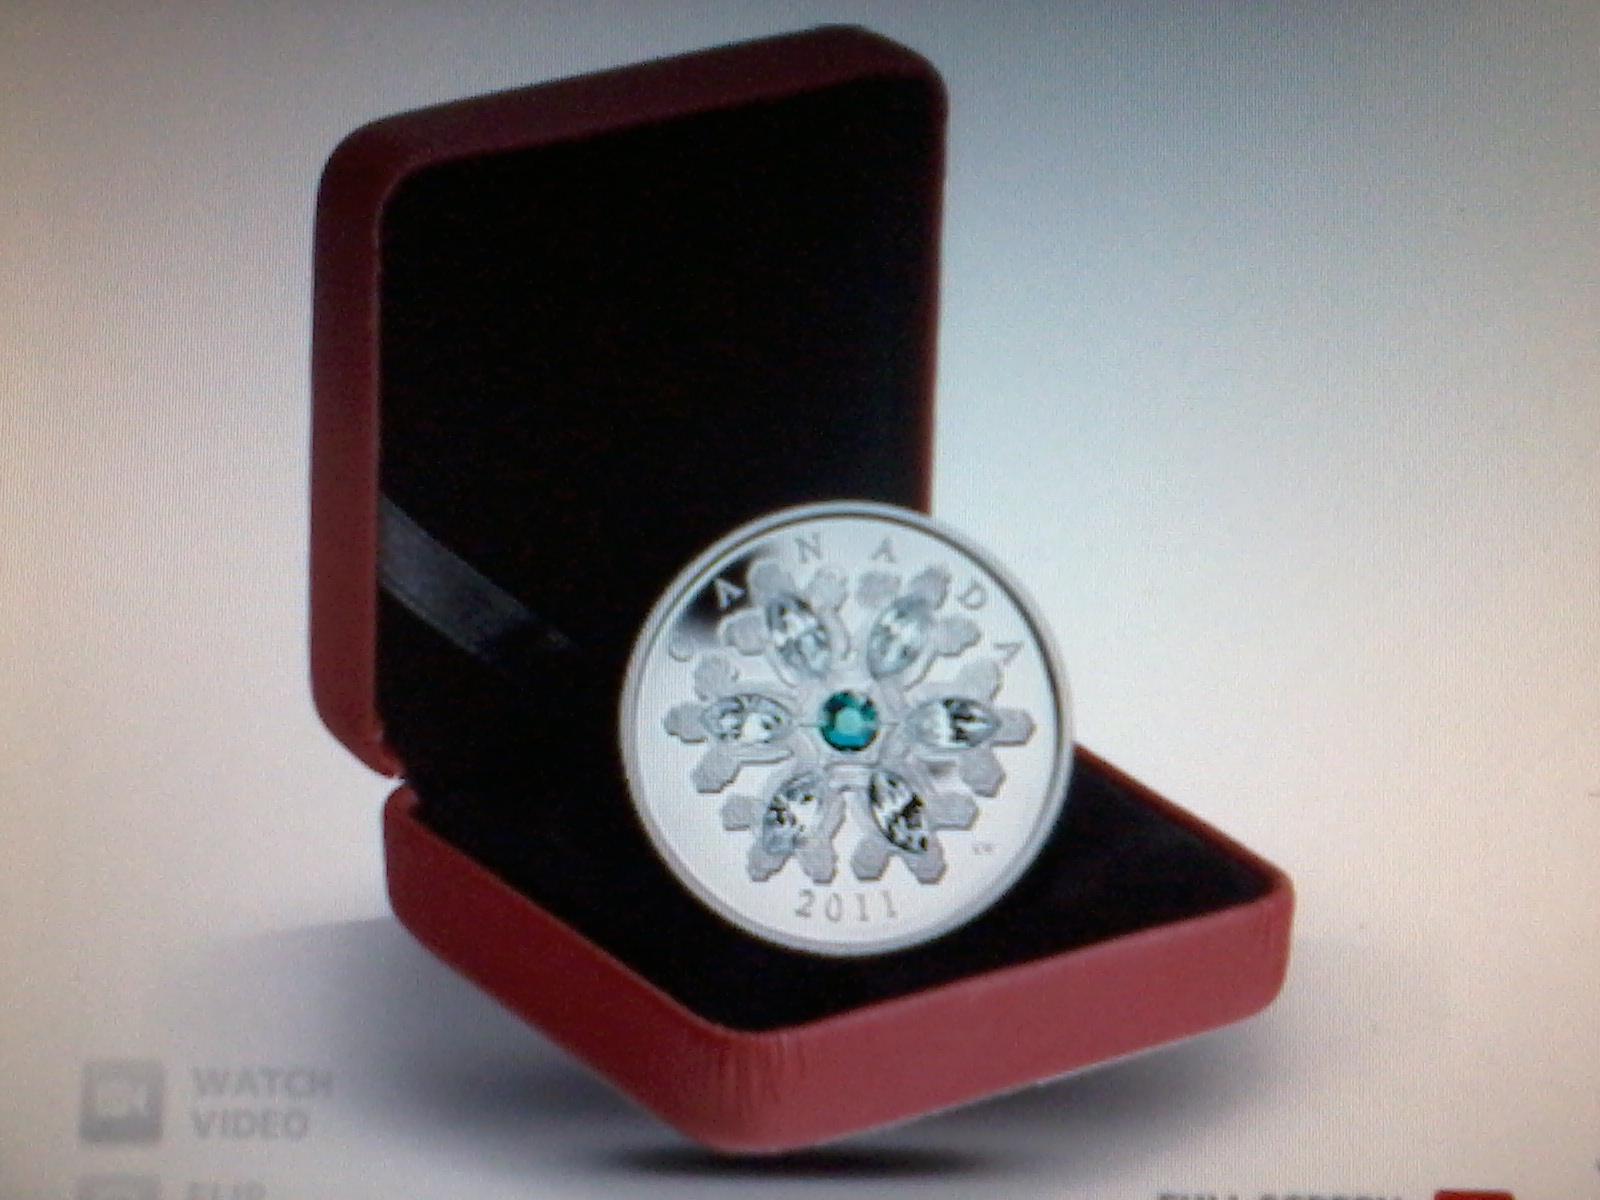 2011 $20 fine Silver Coin - Cystal Snowflake Emerald